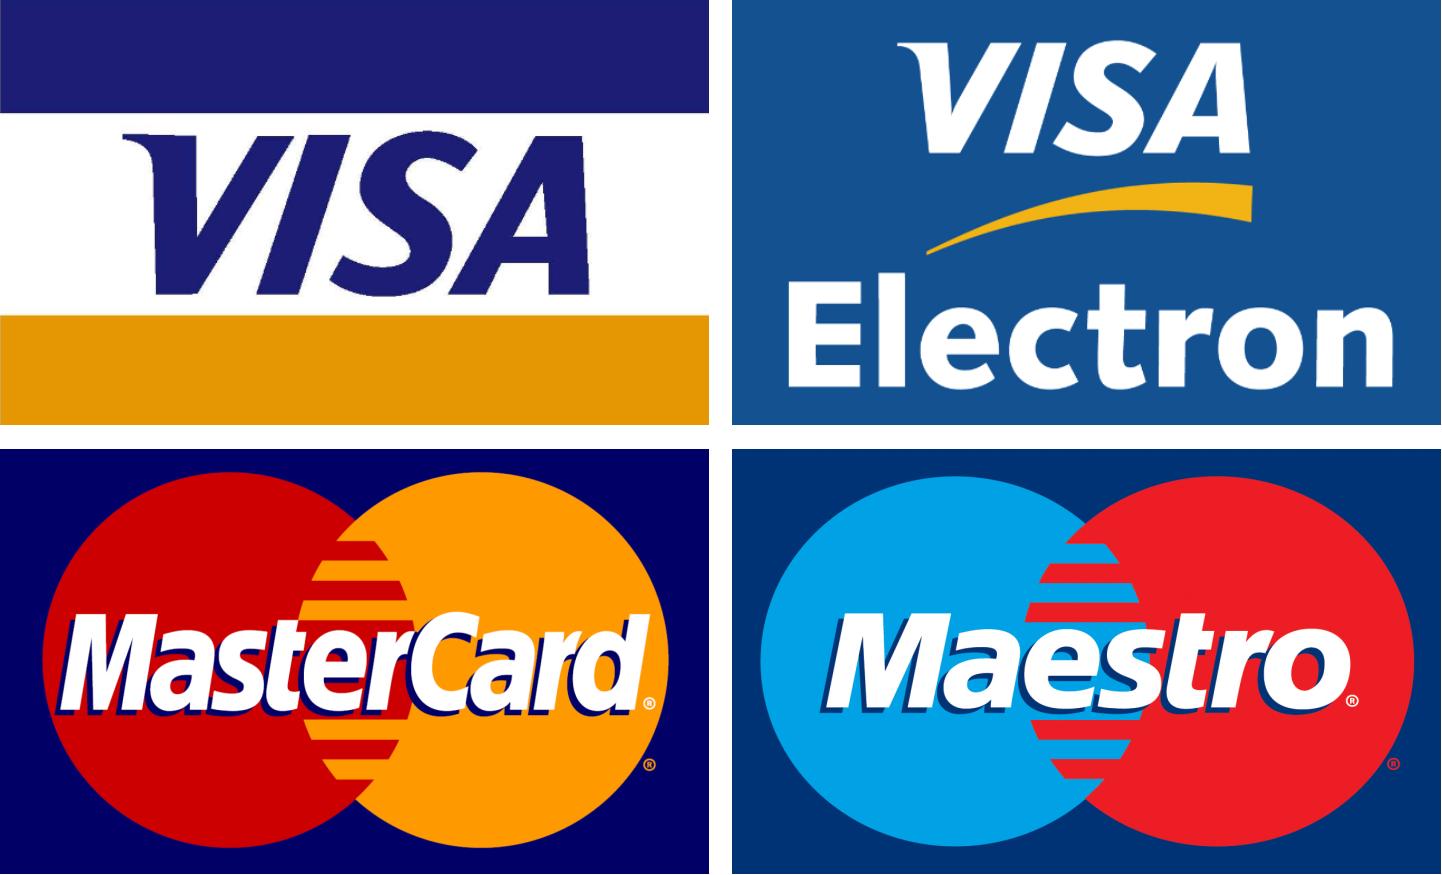 Deposita en el casino con tu tarjeta Visa